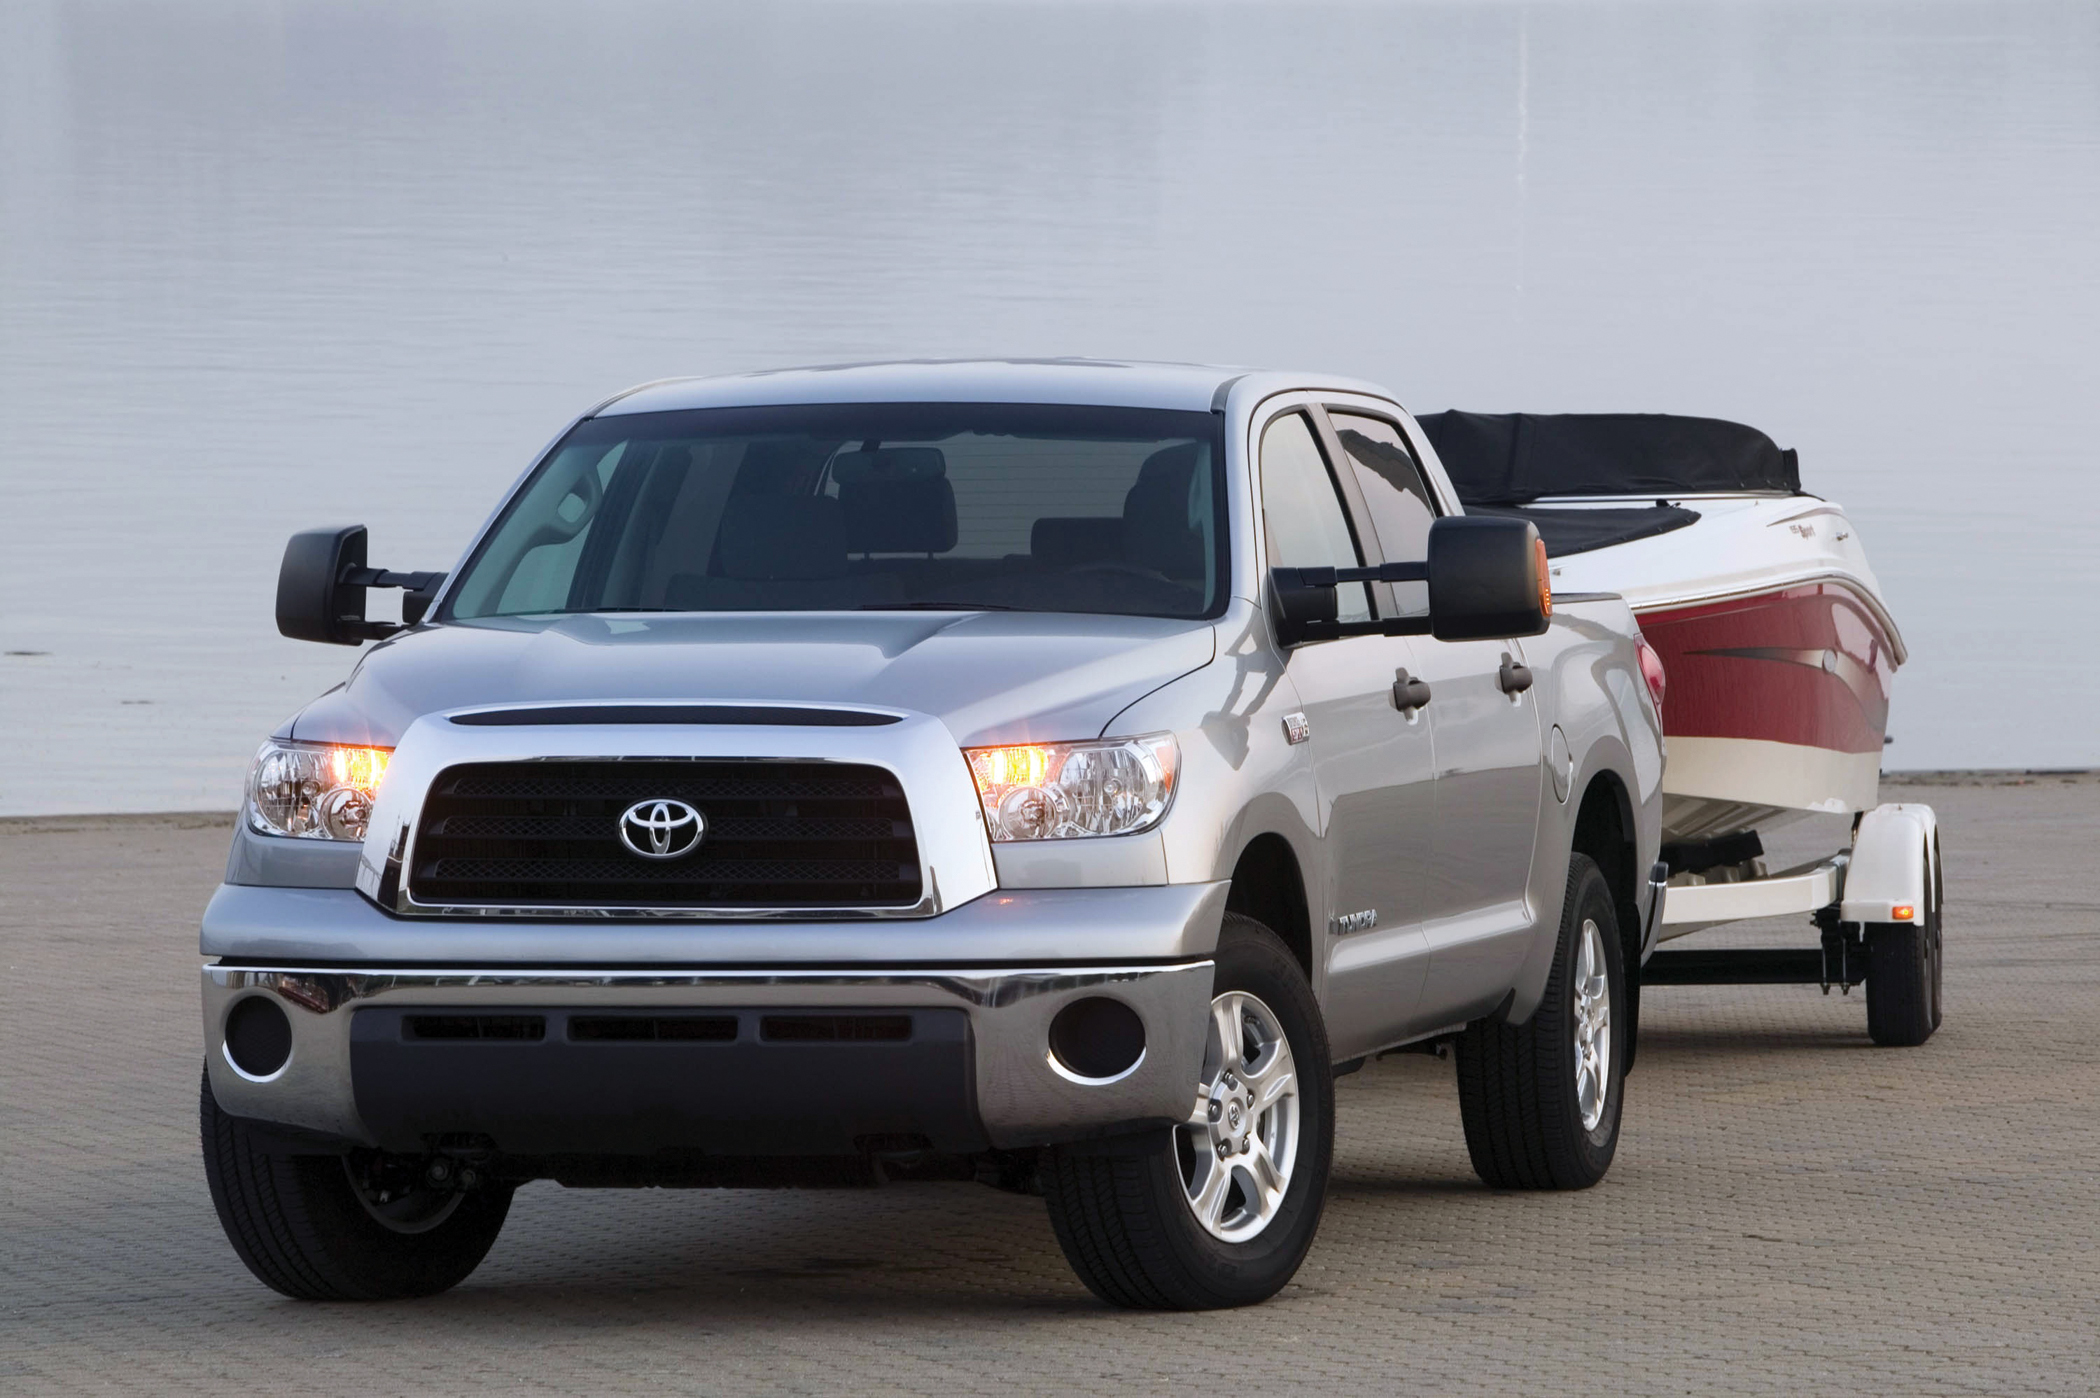 Le Pickup Tundra 1 & 2 Toyotatundracrewmax